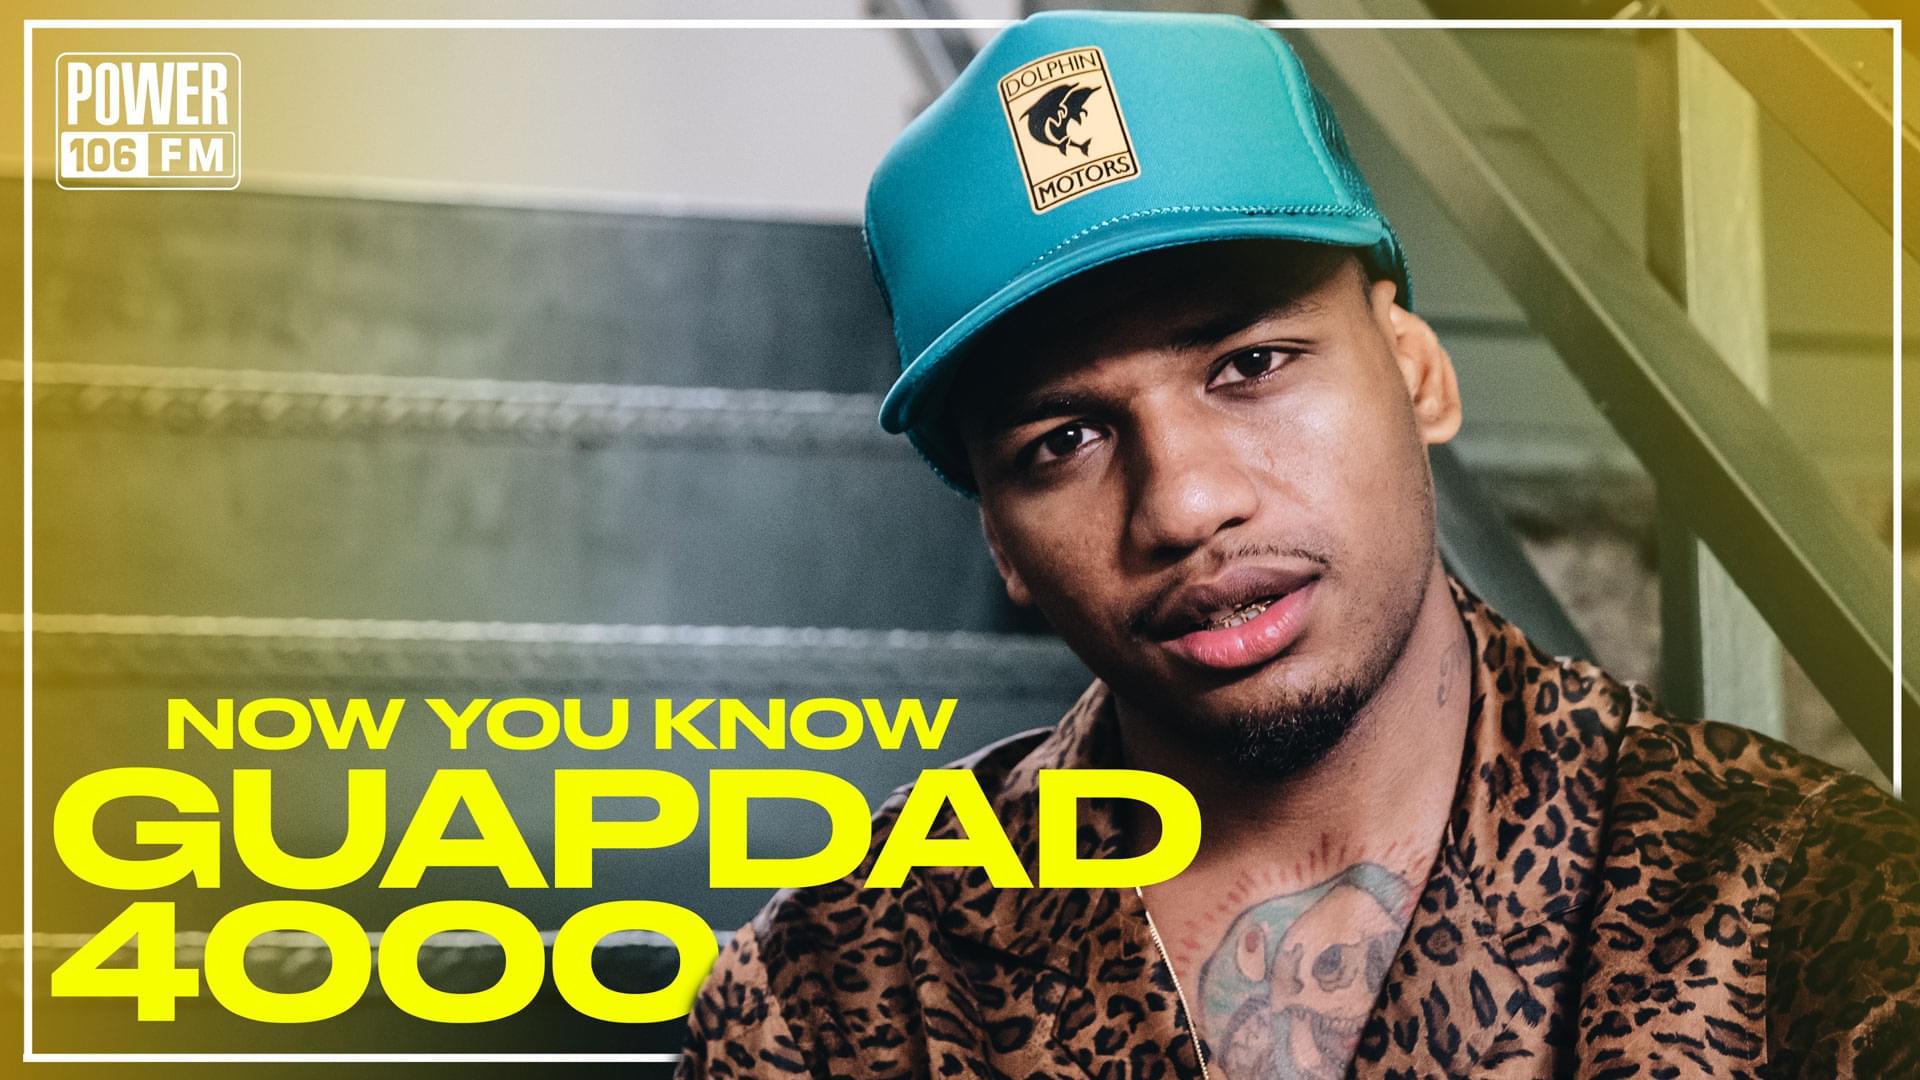 EXCLUSIVE: Who Is Guapdad 4000?